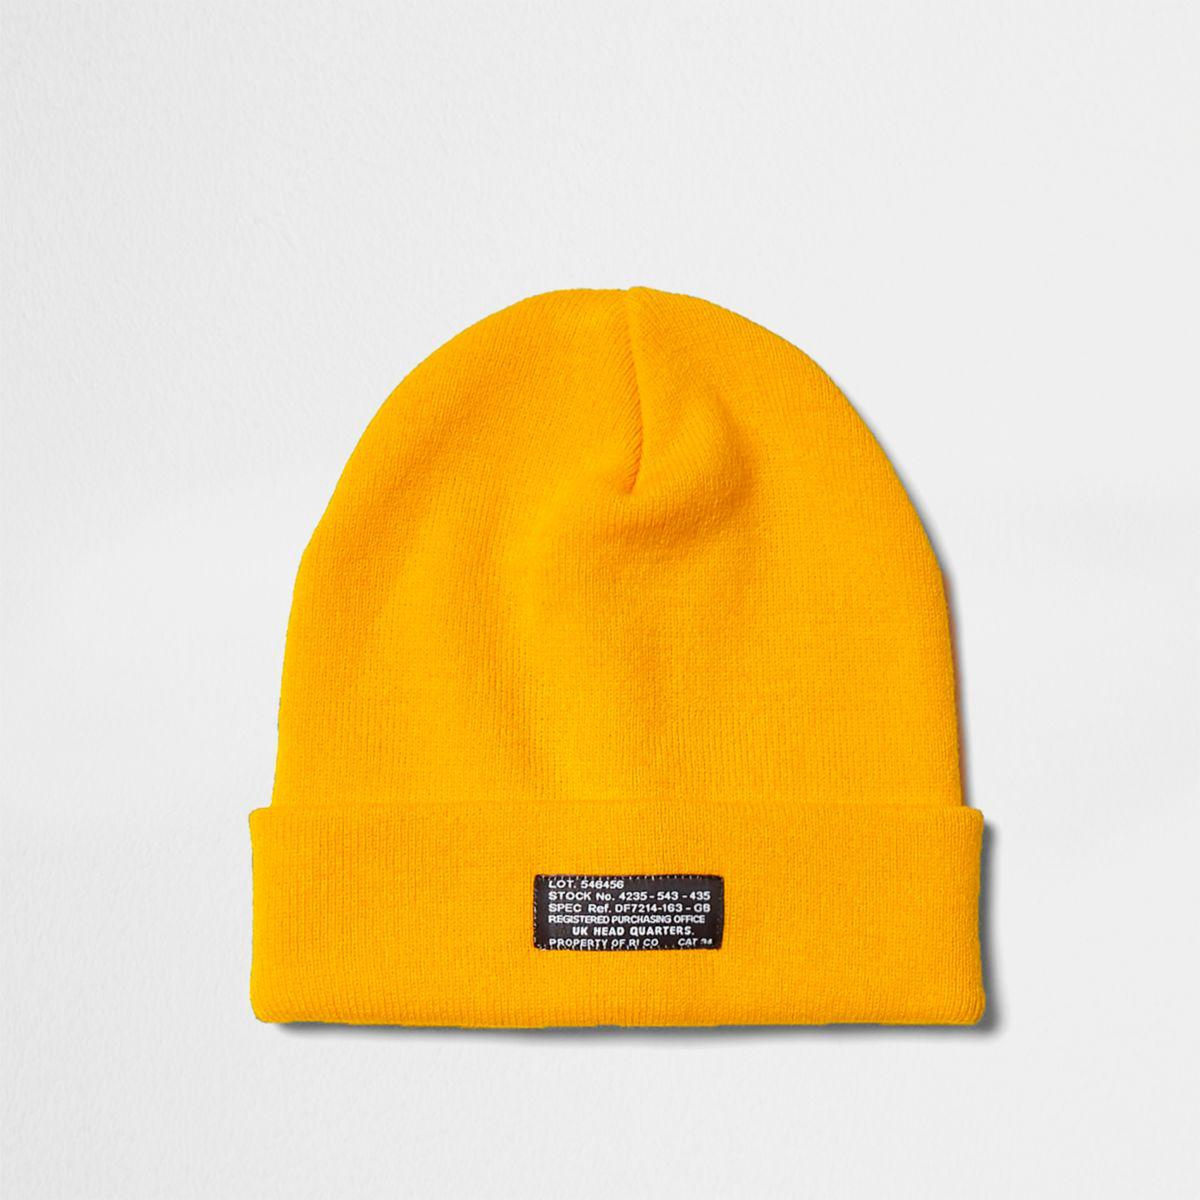 River Island Cotton Yellow Knit Beanie Hat Yellow Knit